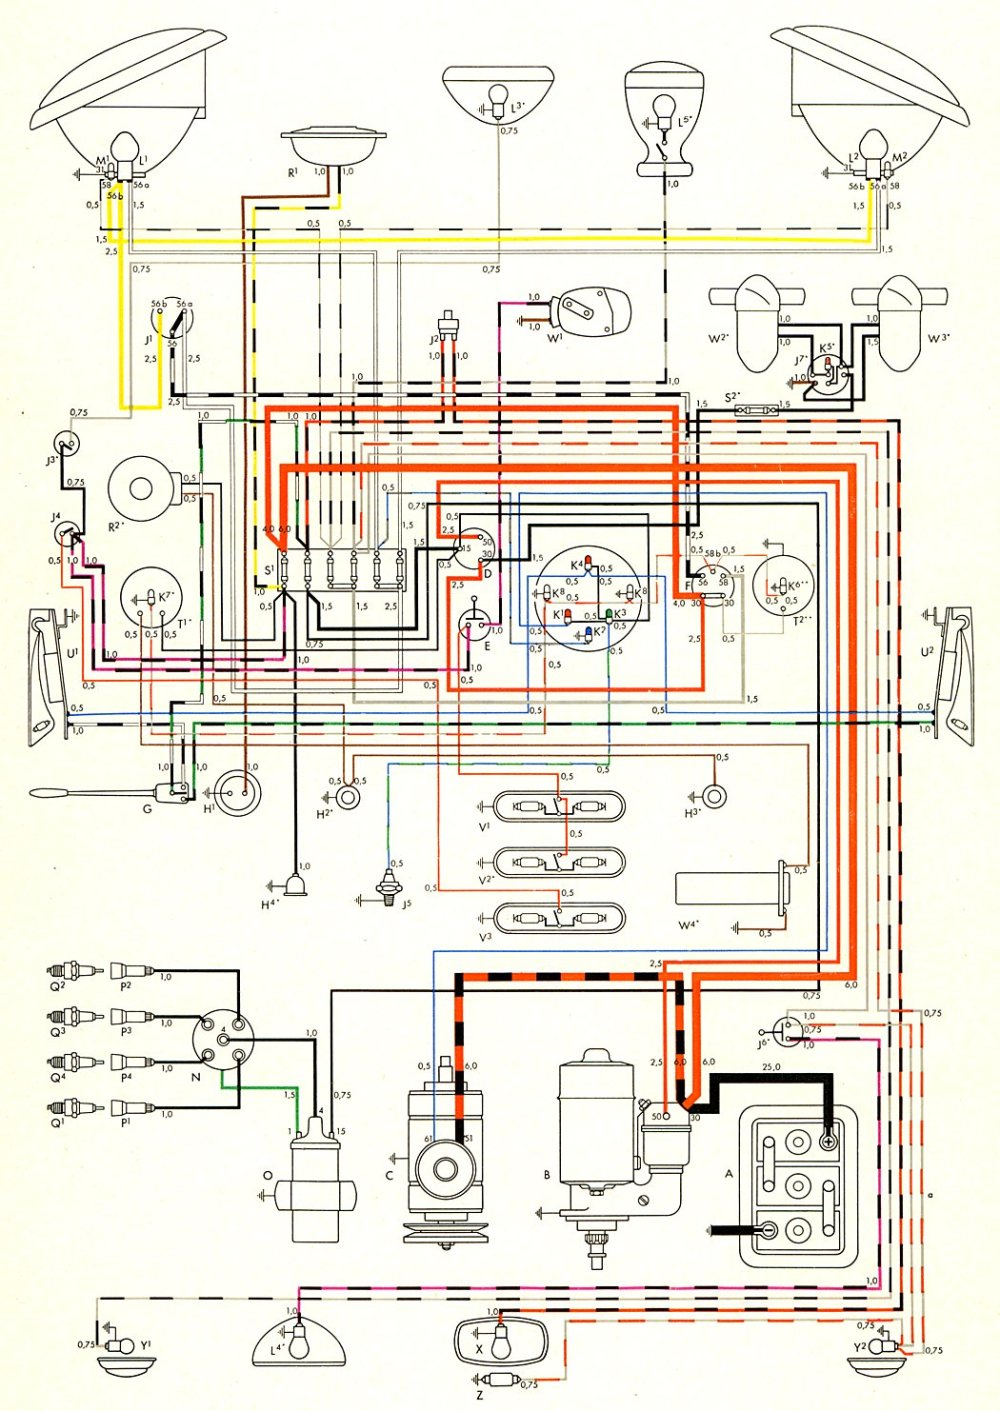 medium resolution of 98 vw golf fuse box diagram